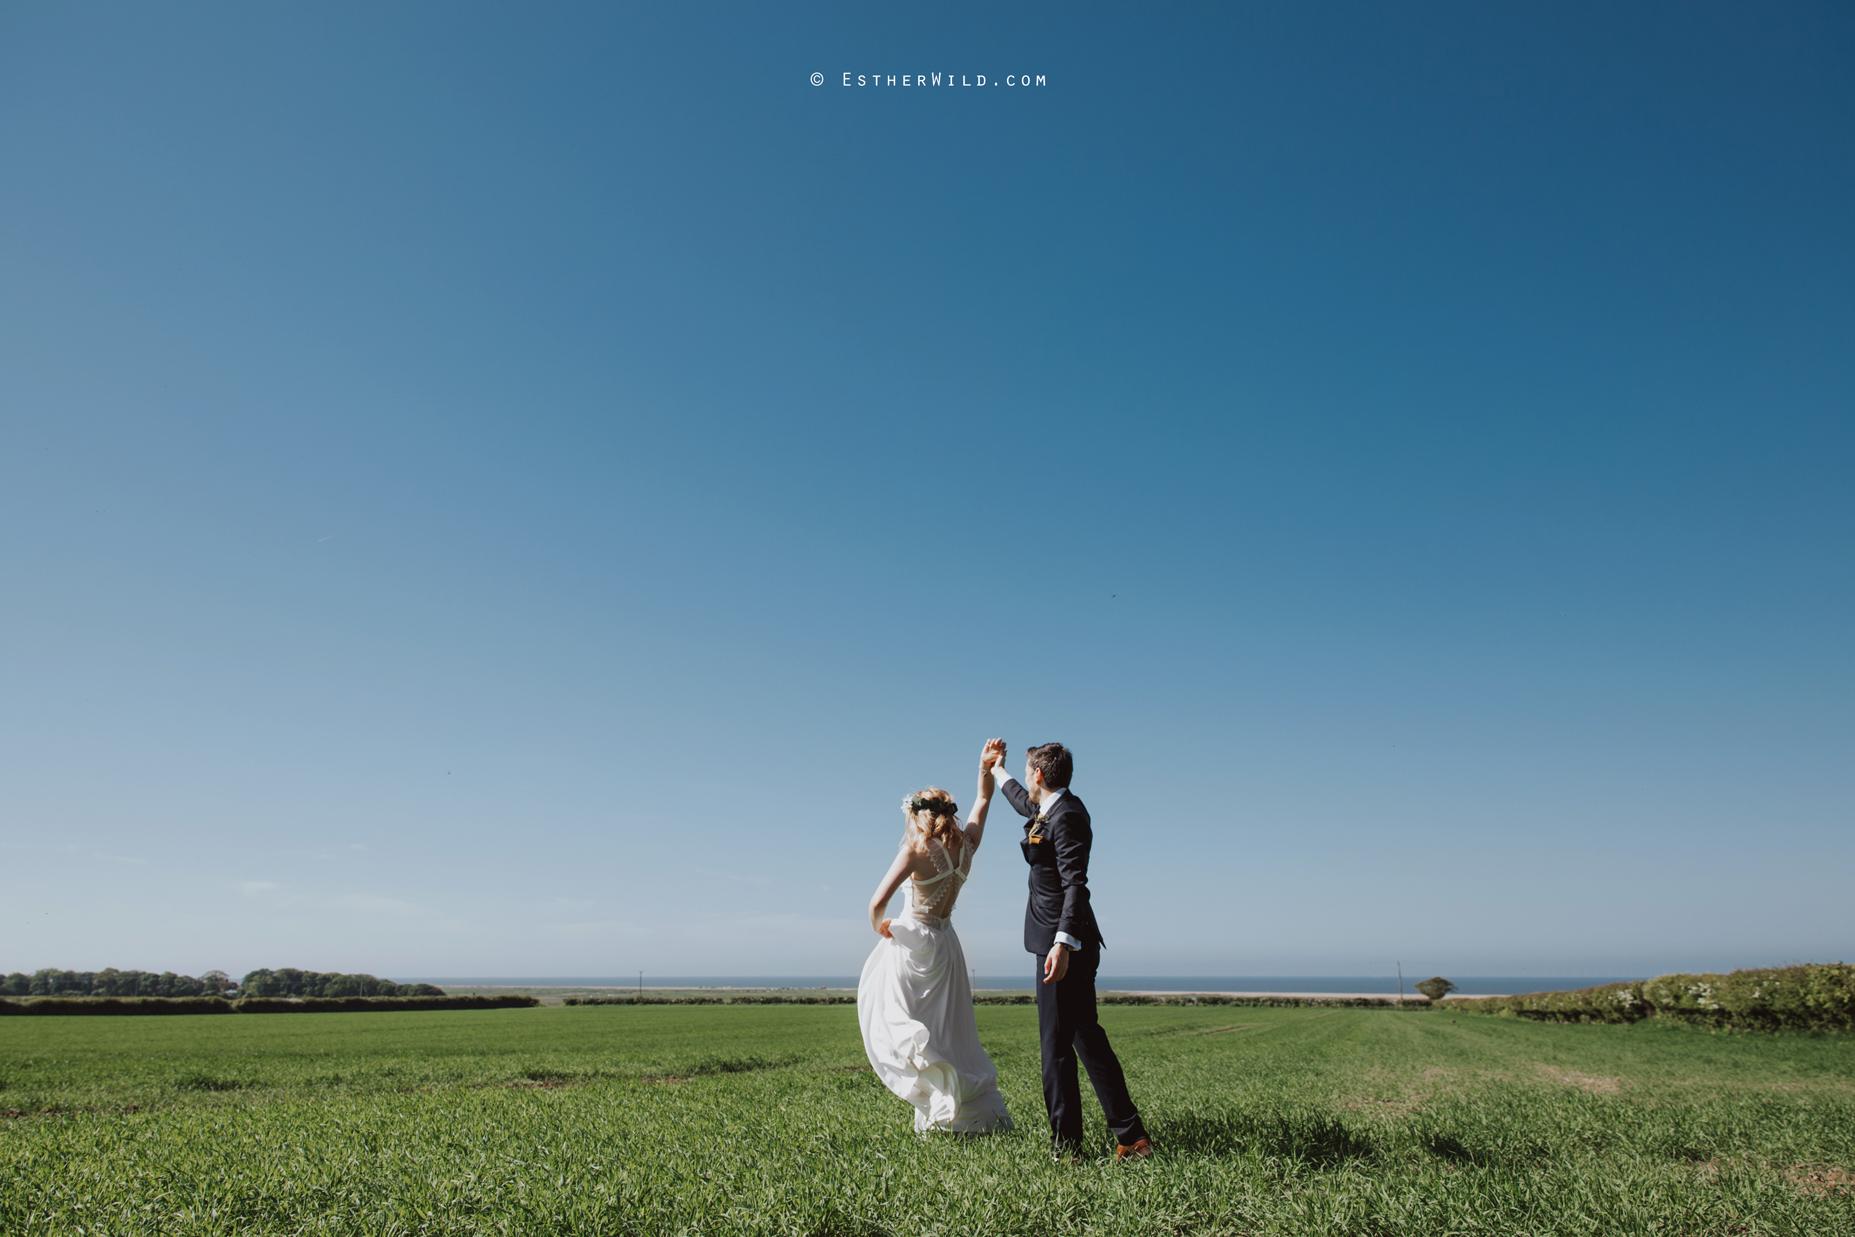 IMG_1484Cley_Barn_Drift_Norfolk_Coast_Wedding_Copyright_Esther_Wild_Photographer_.jpg